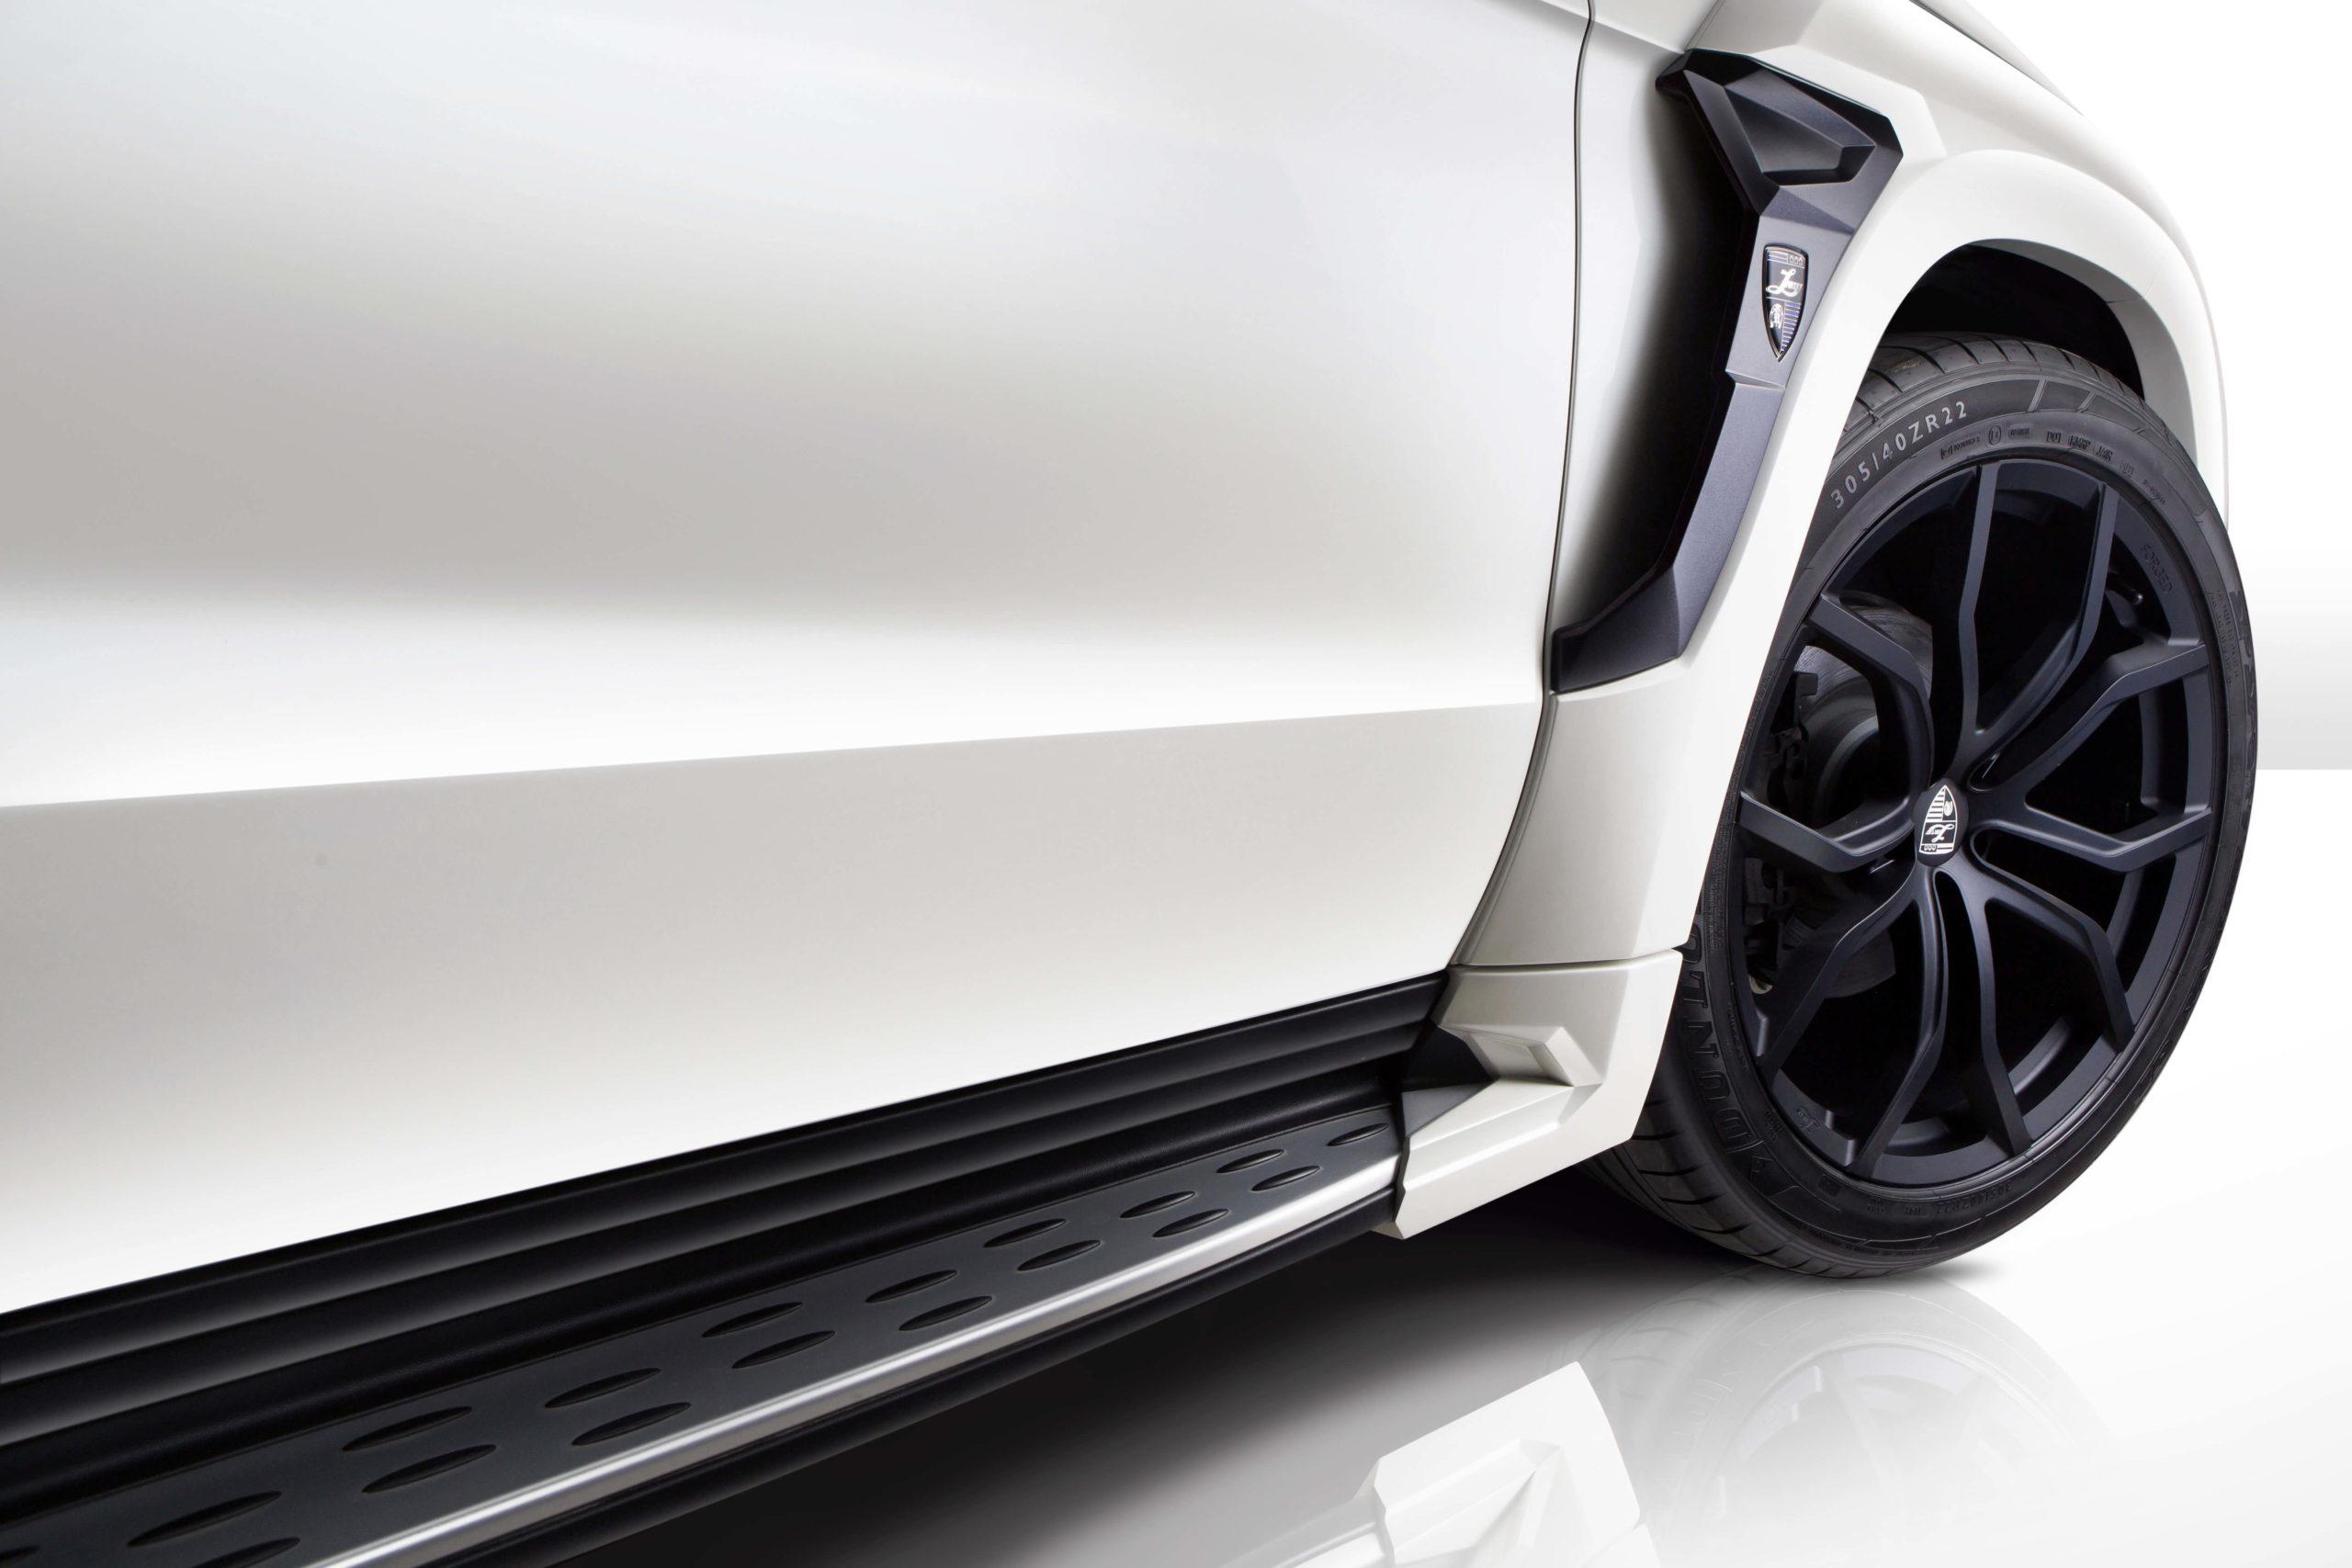 Нижняя дверца для Mercedes-Benz GL от Larte